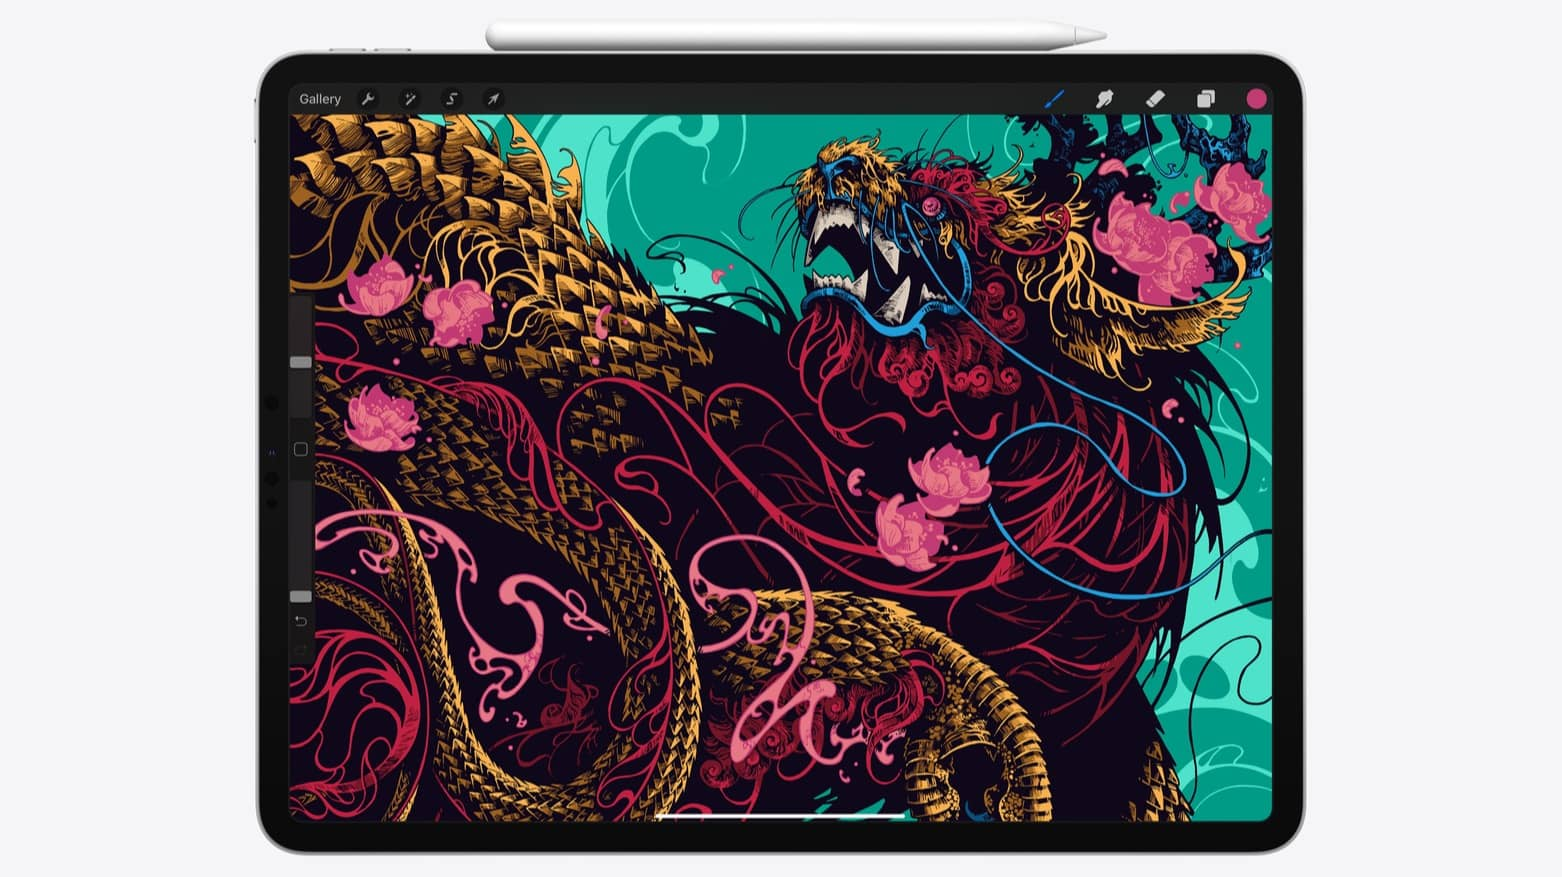 2020 iPad Pro with Apple Pencil